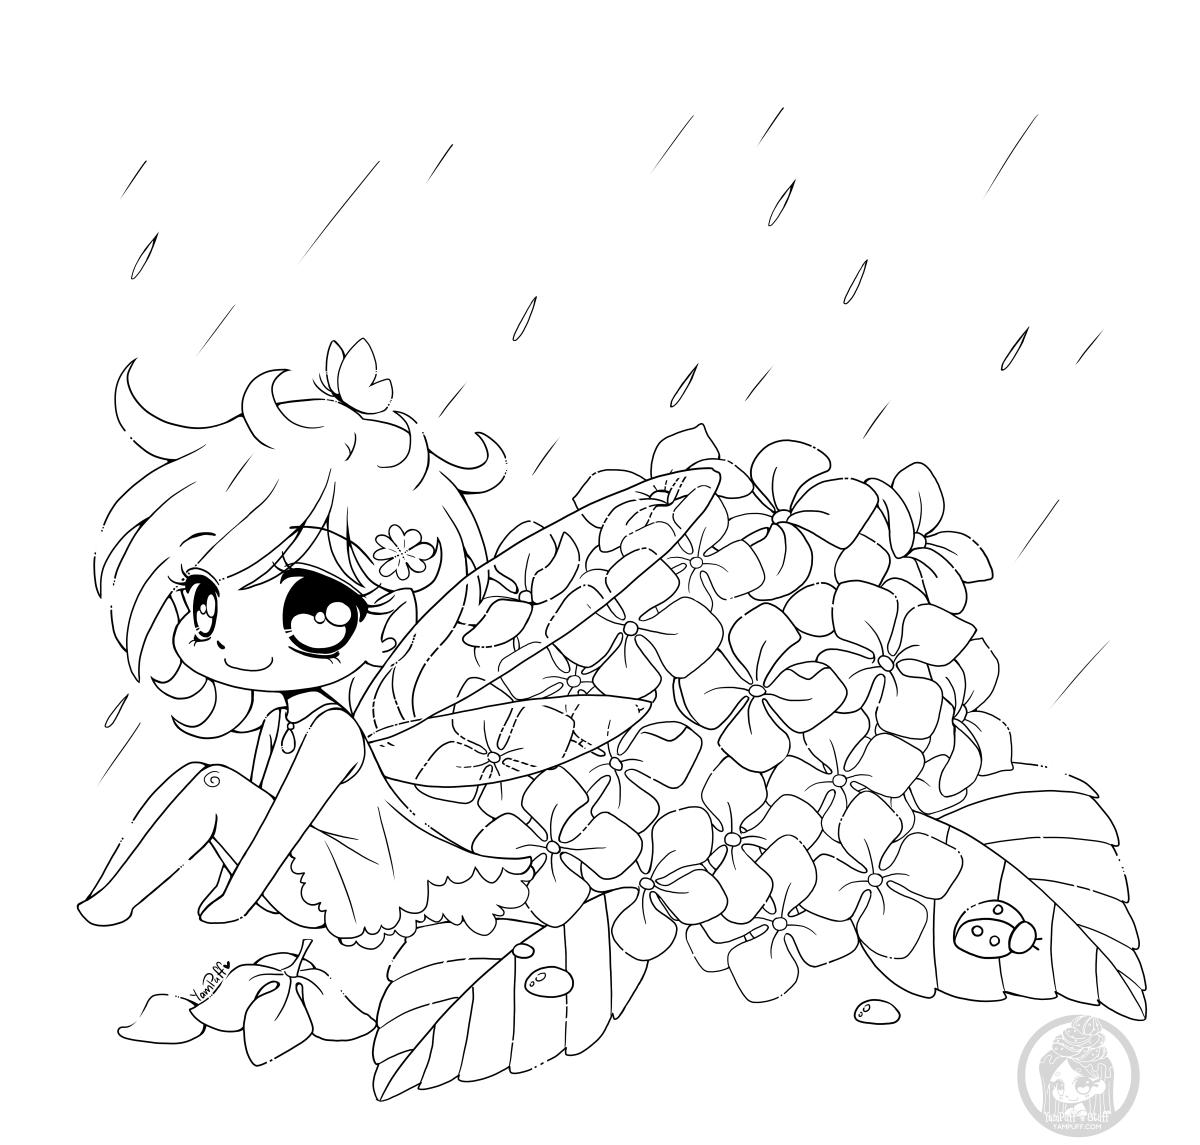 Fee Kawaii Dessin Gratuit Fleur Hydrangee A Colorier Dessin